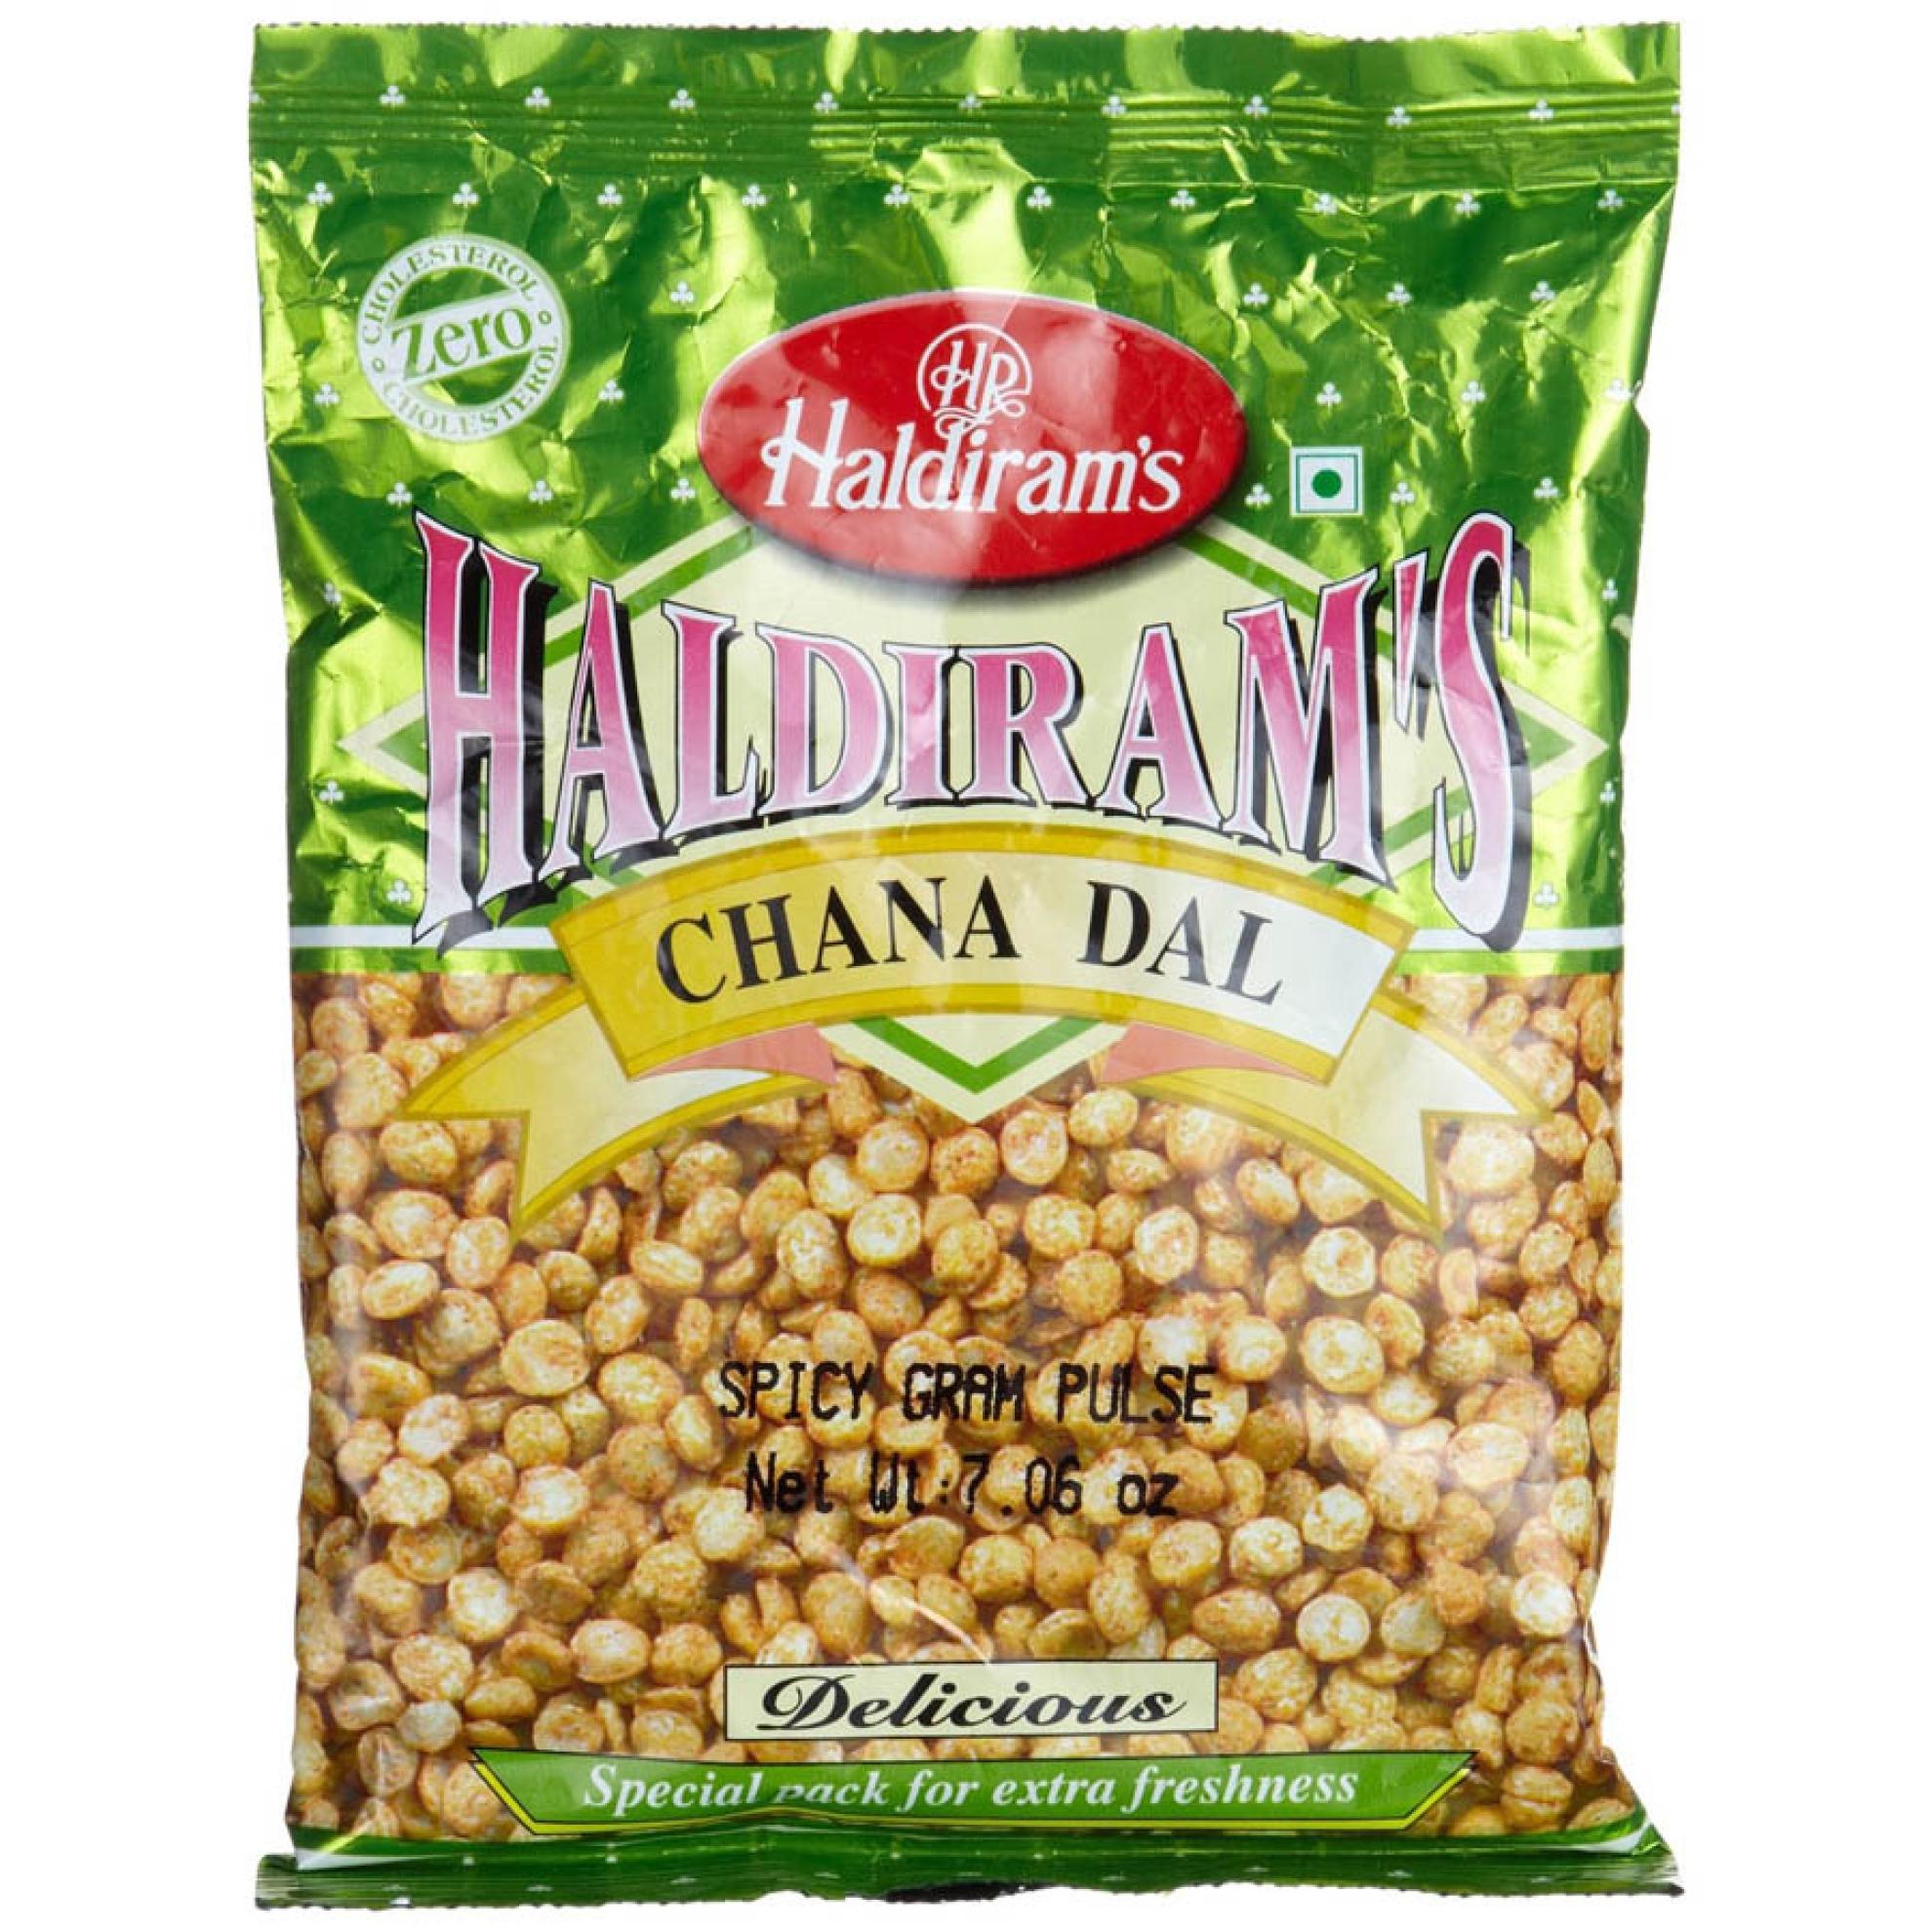 Haldiram Chana Dal (Spicy Fried Split Gram Pulse) 200g